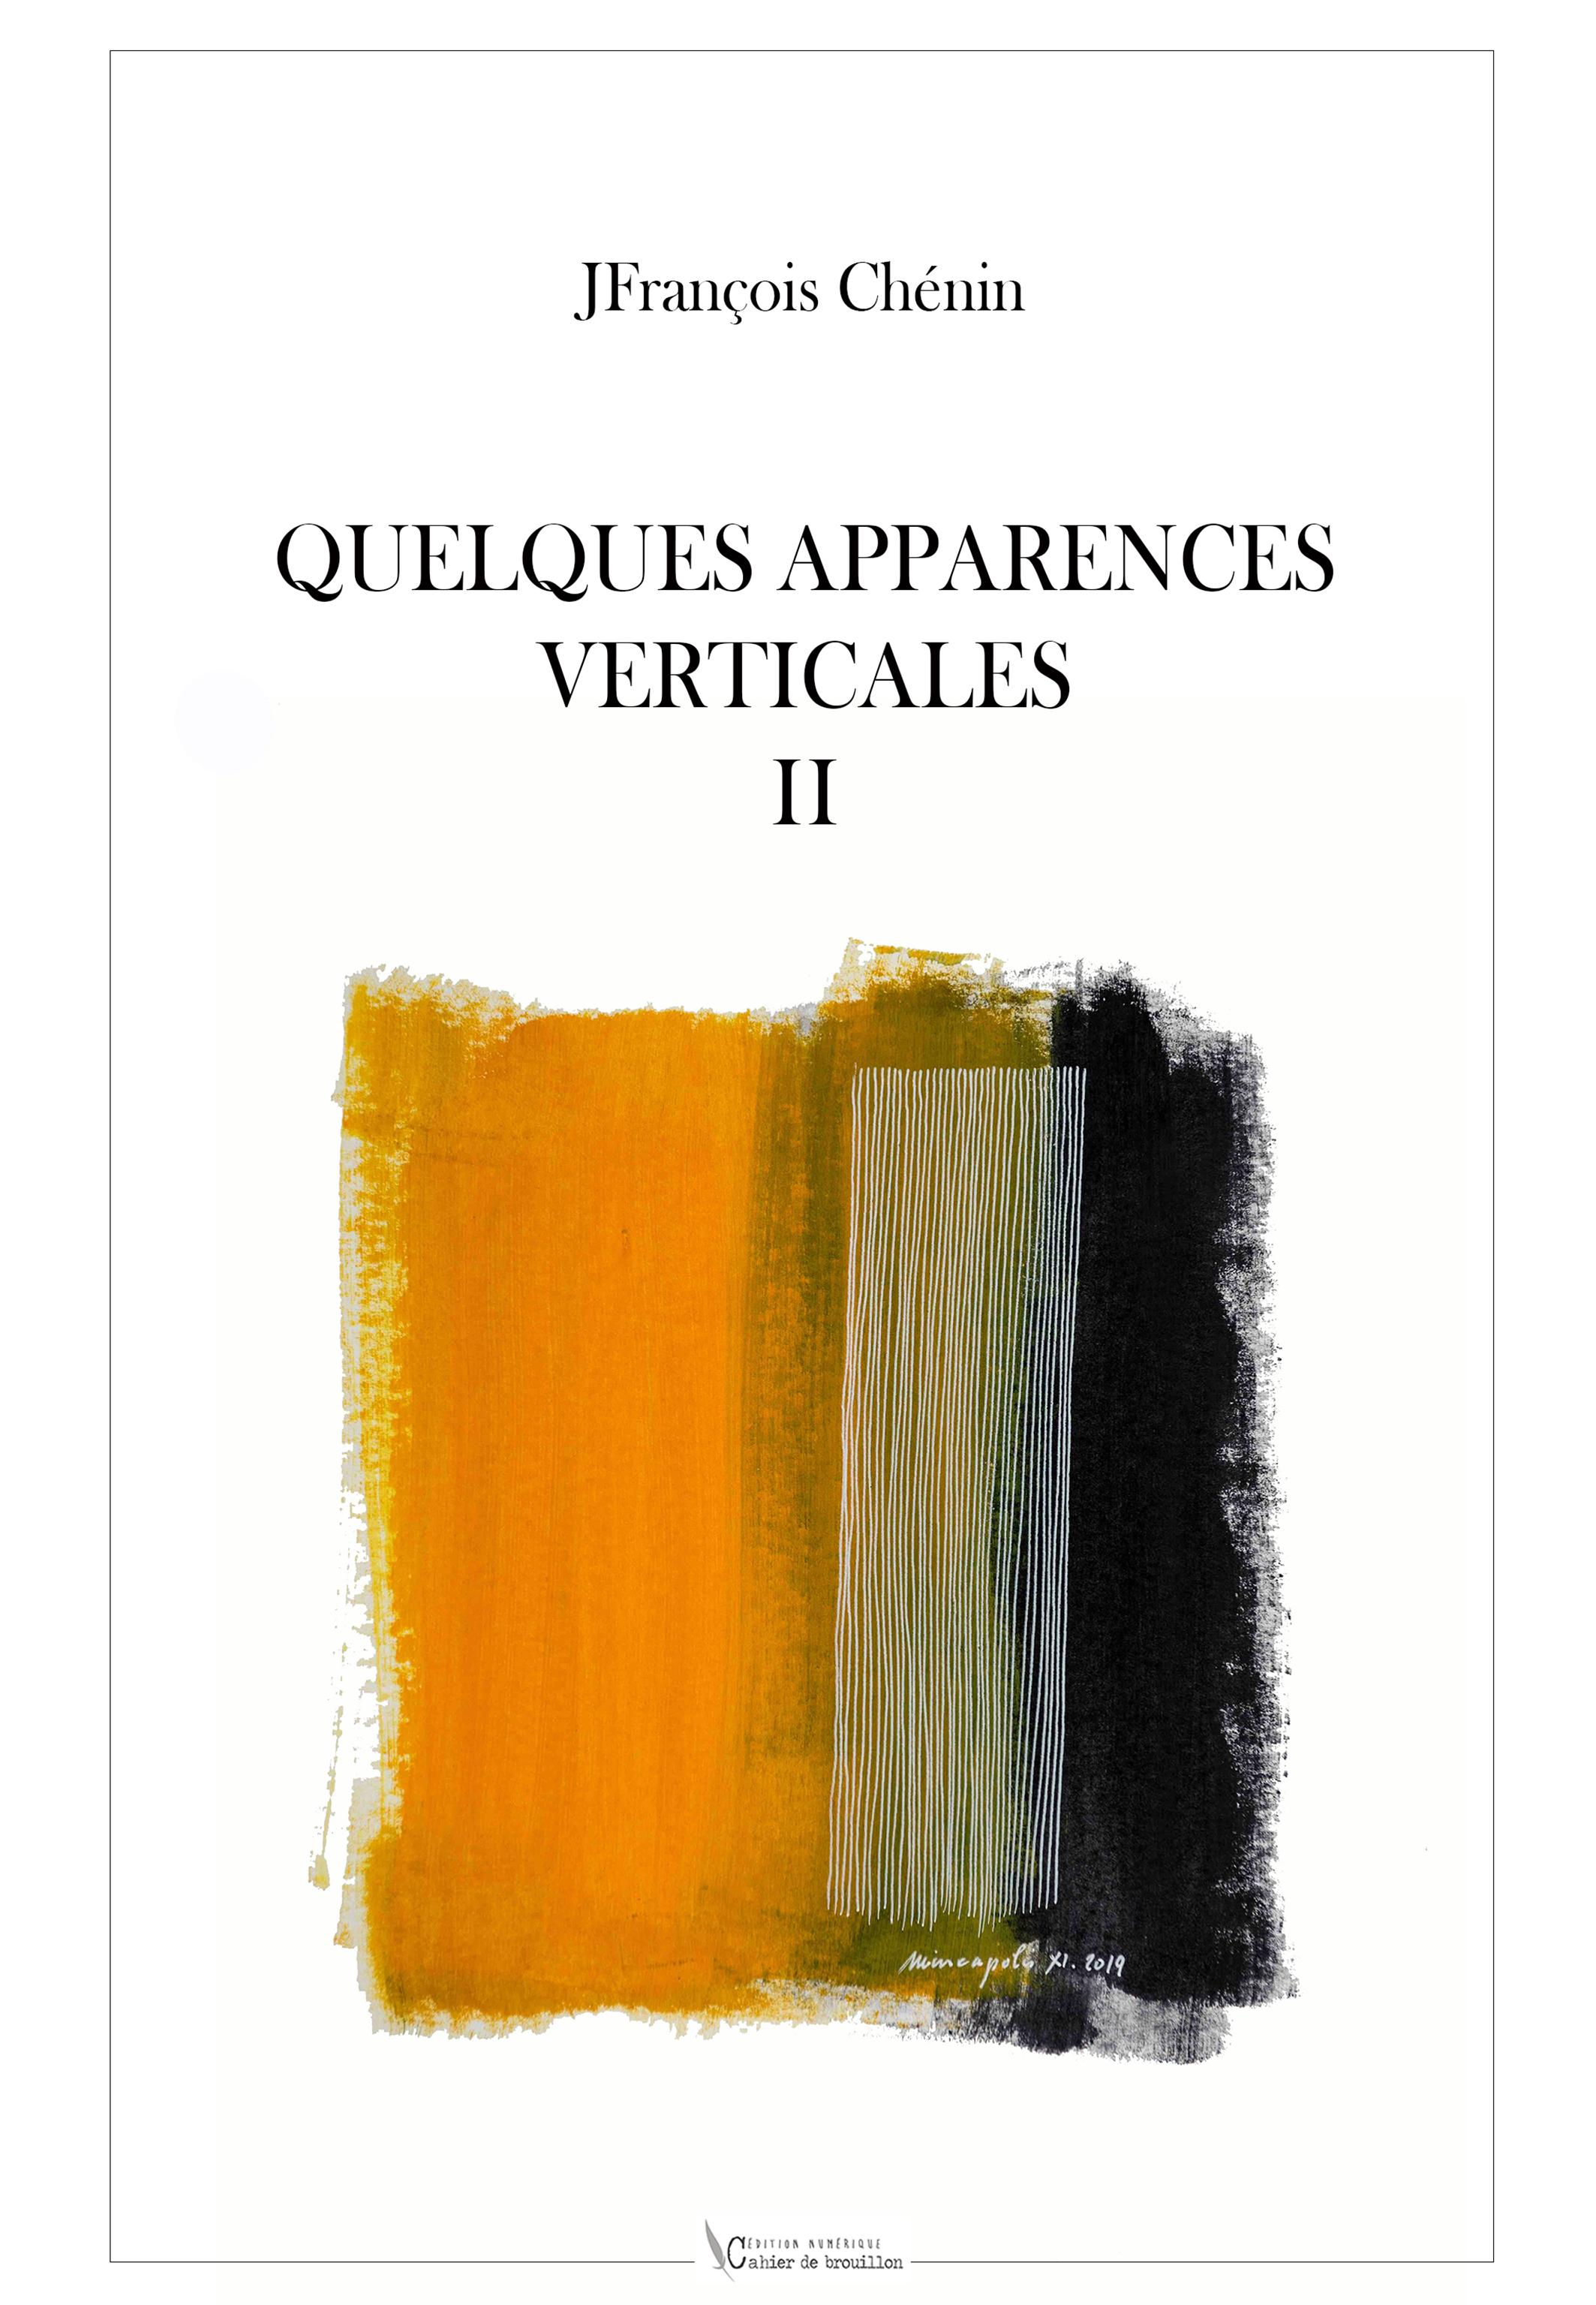 QUELQUES APPARENCES VERTICALES II